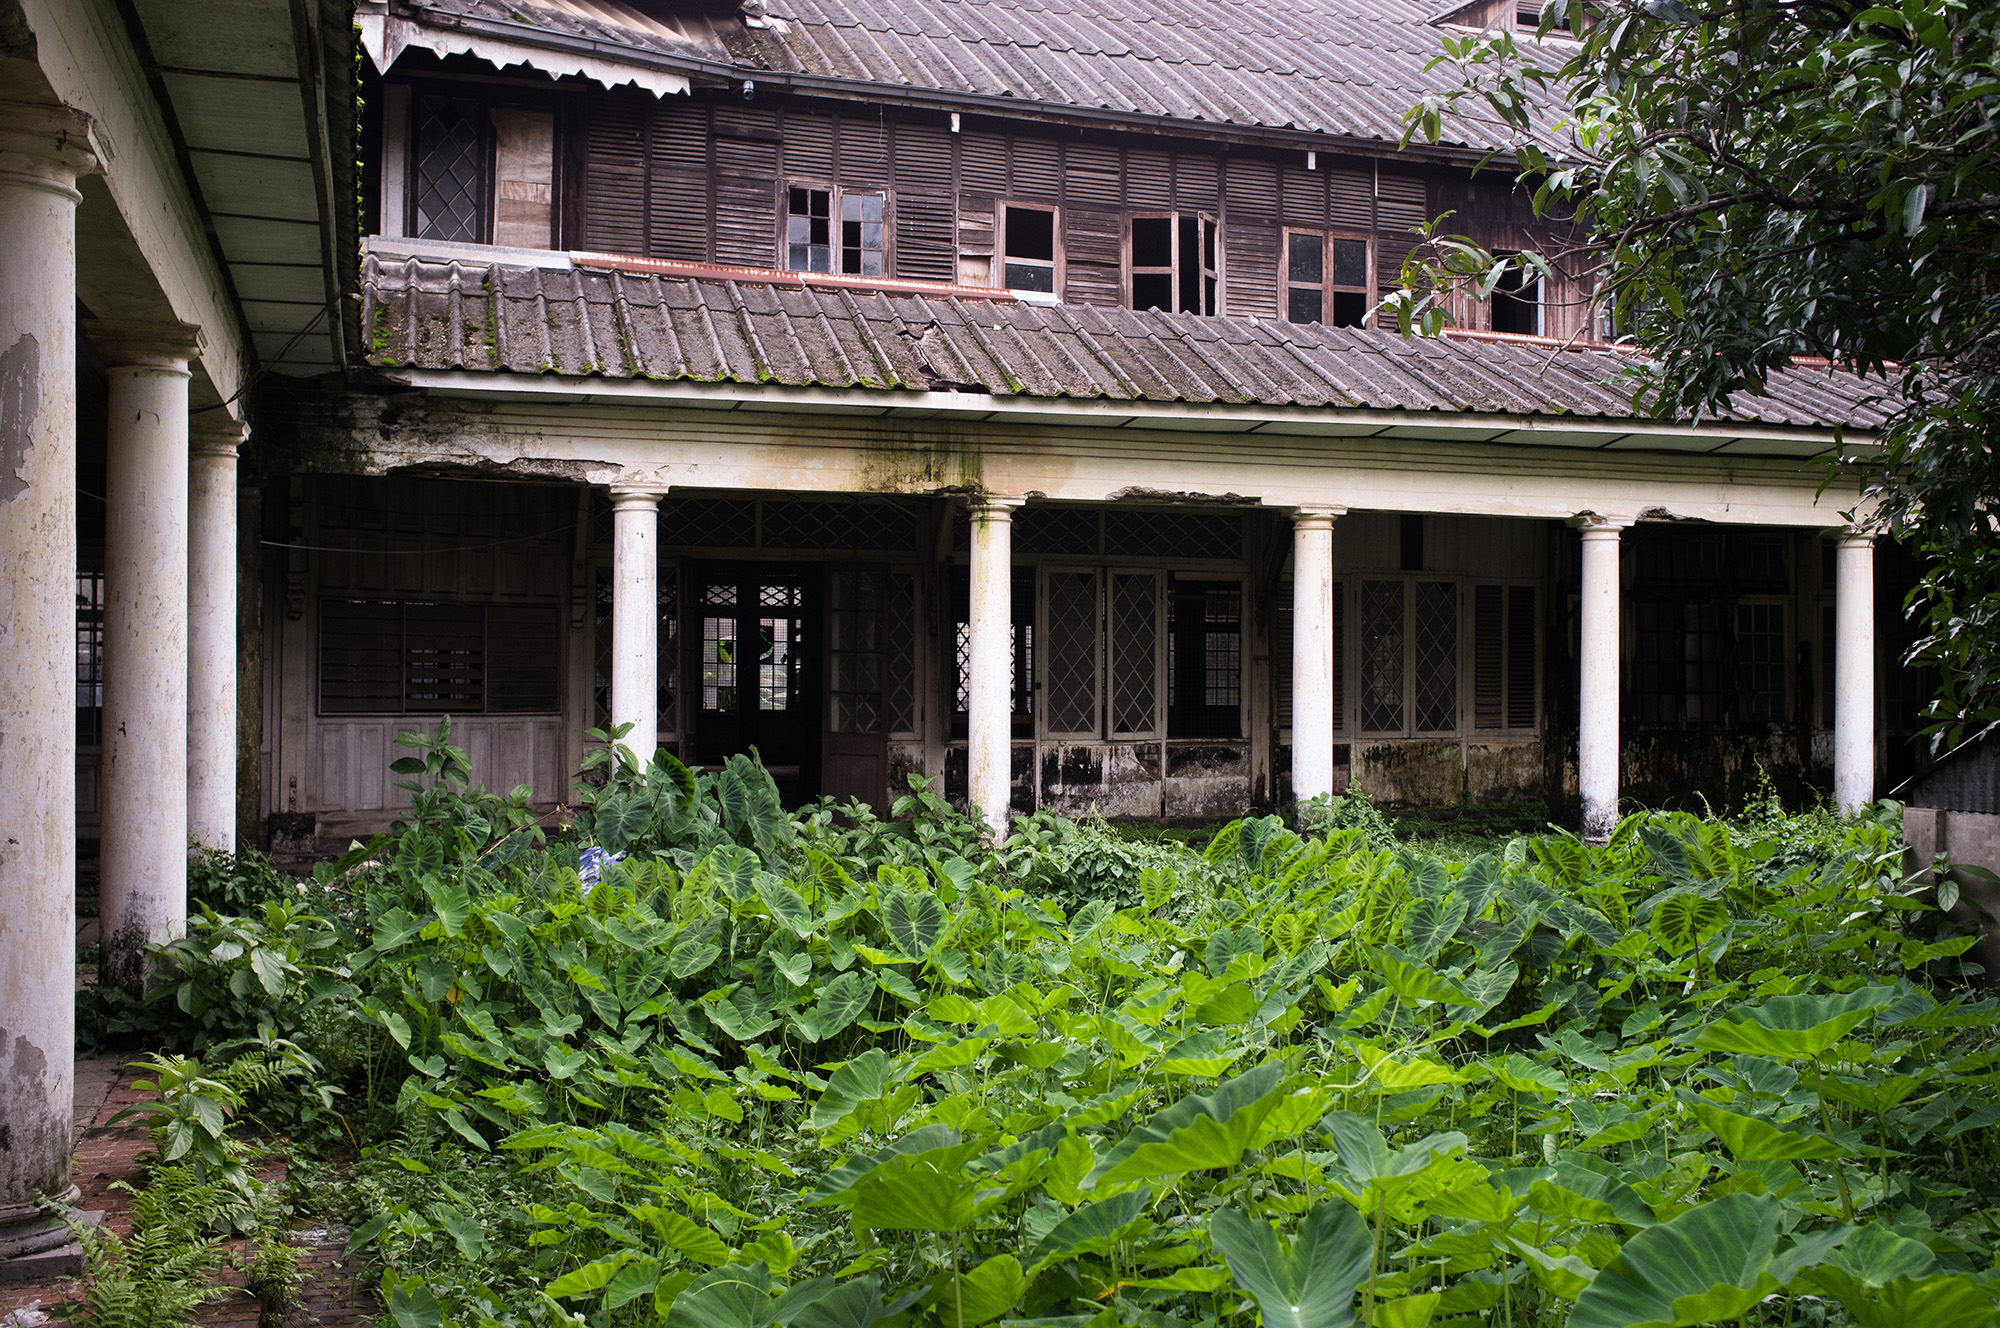 Overgrown courtyard.